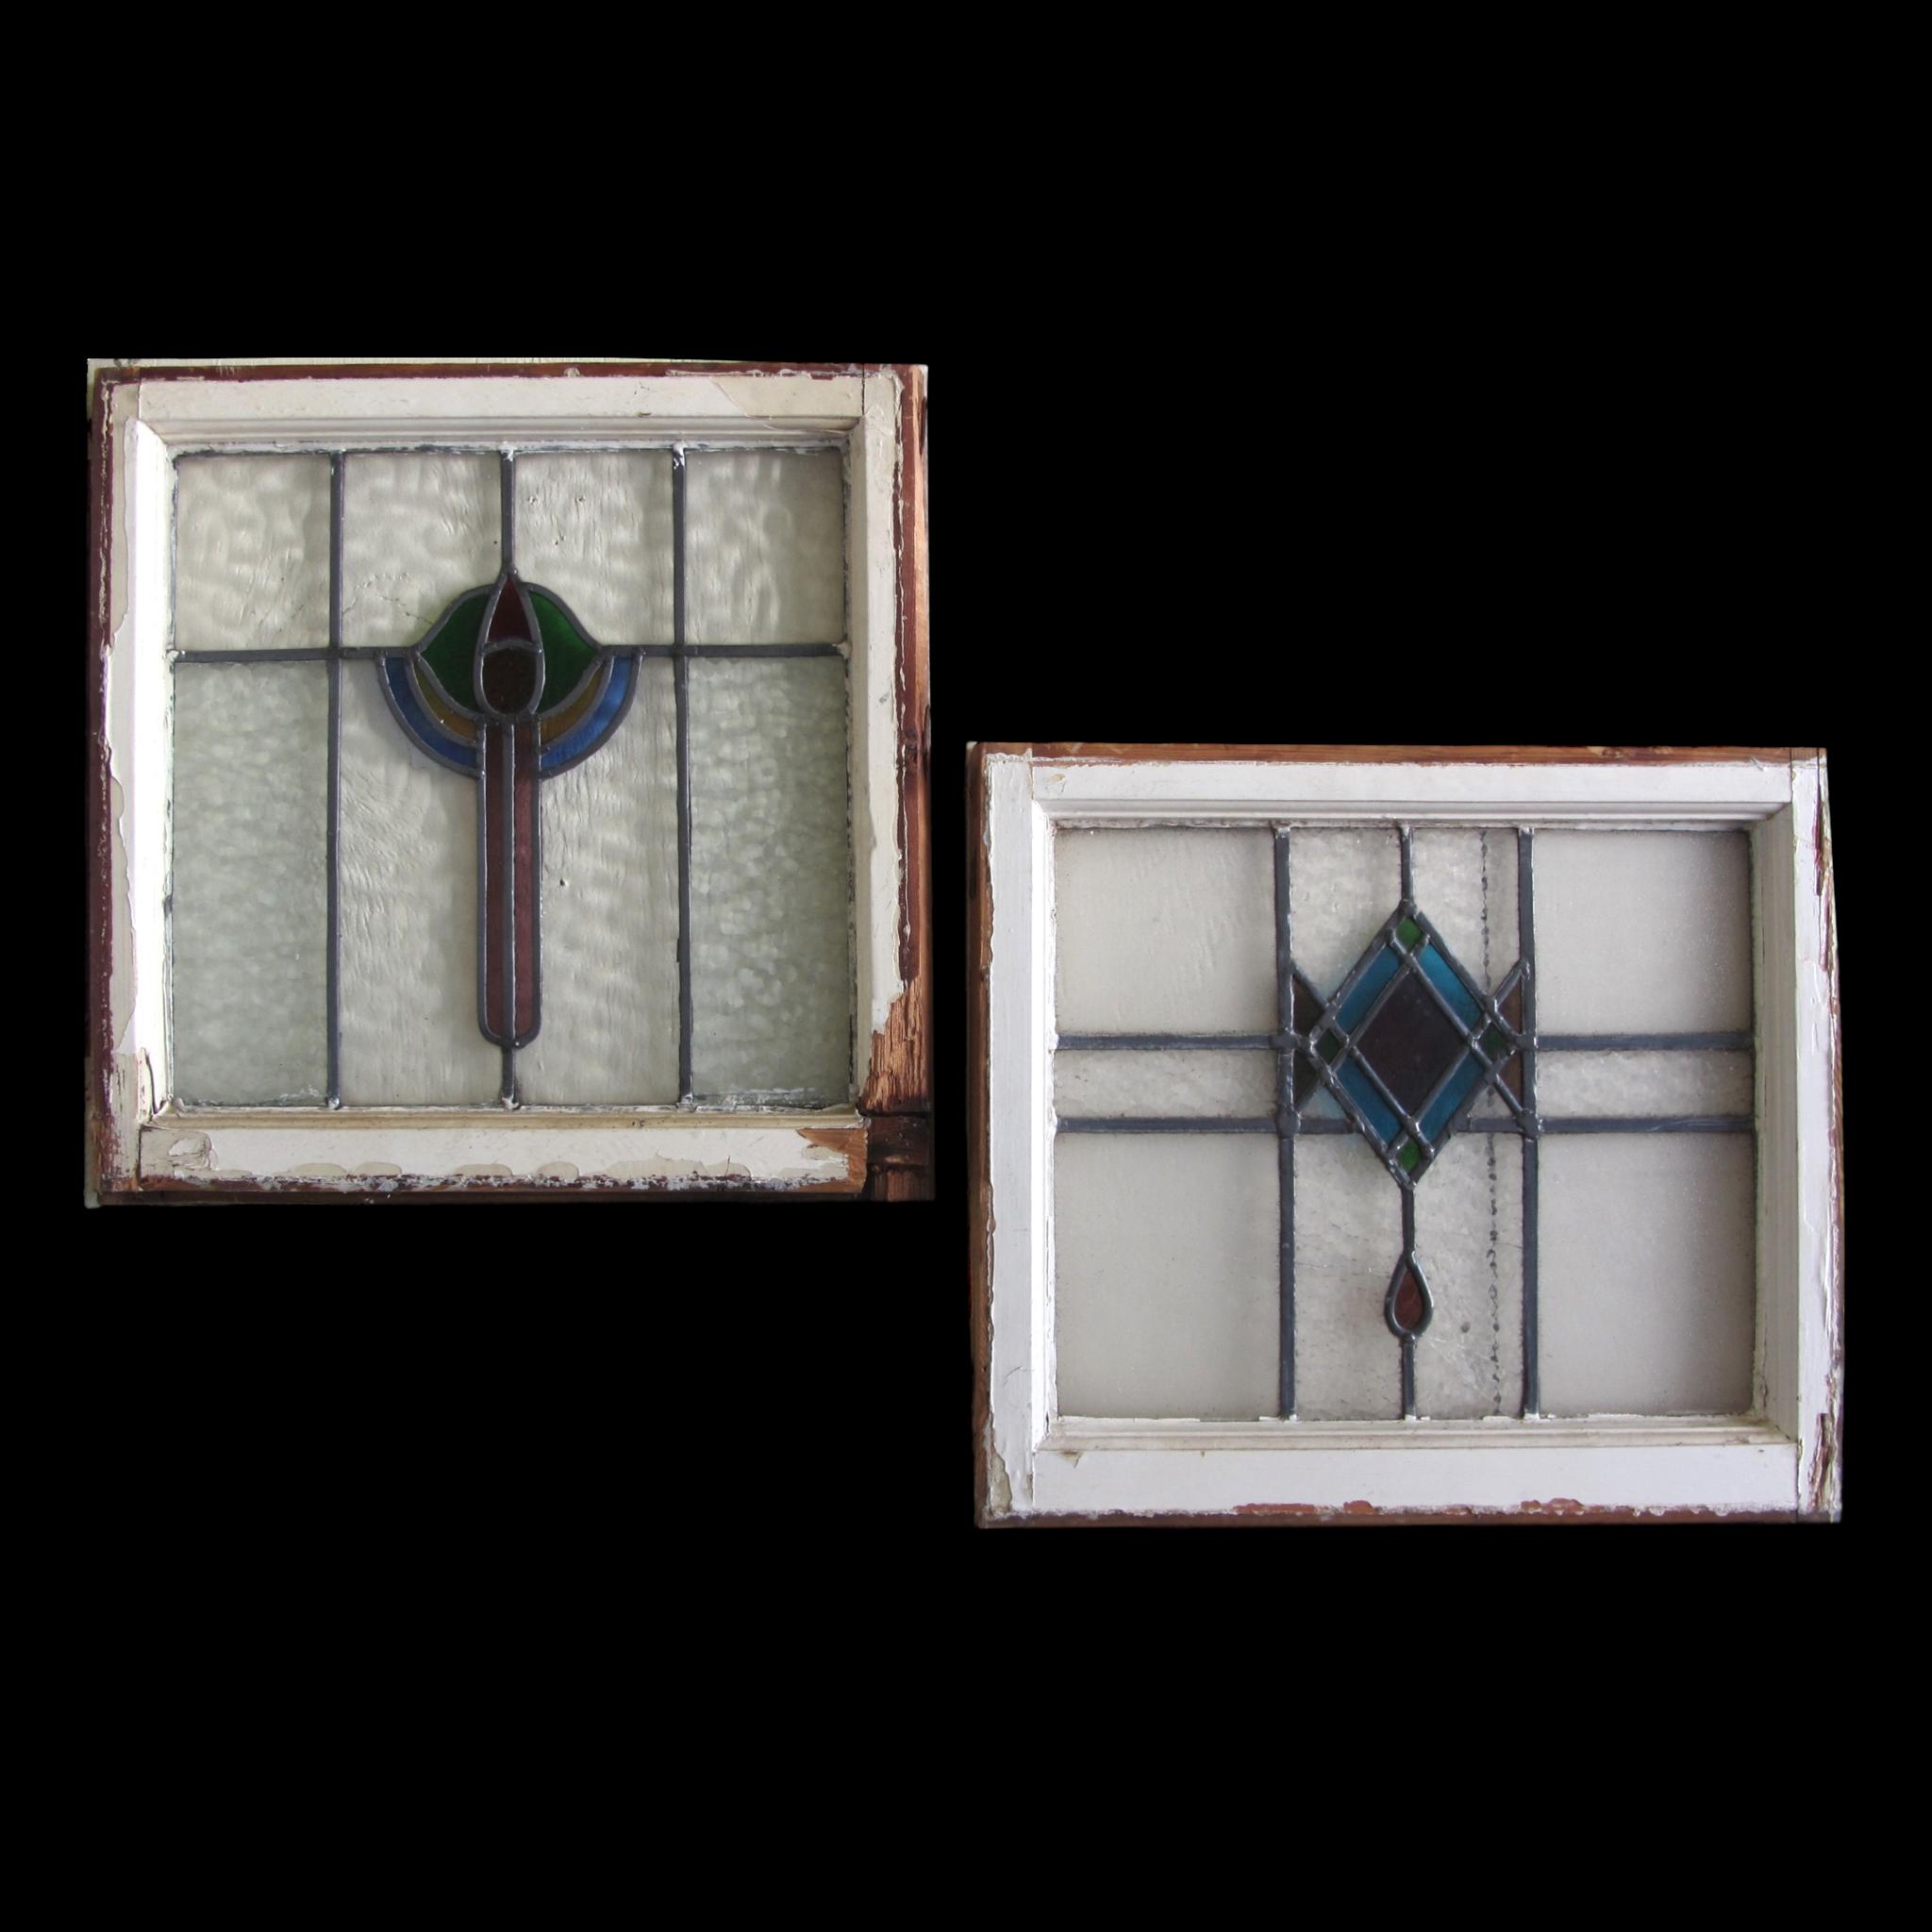 Nett Multi Window Picture Frames Bilder - Rahmen Ideen ...